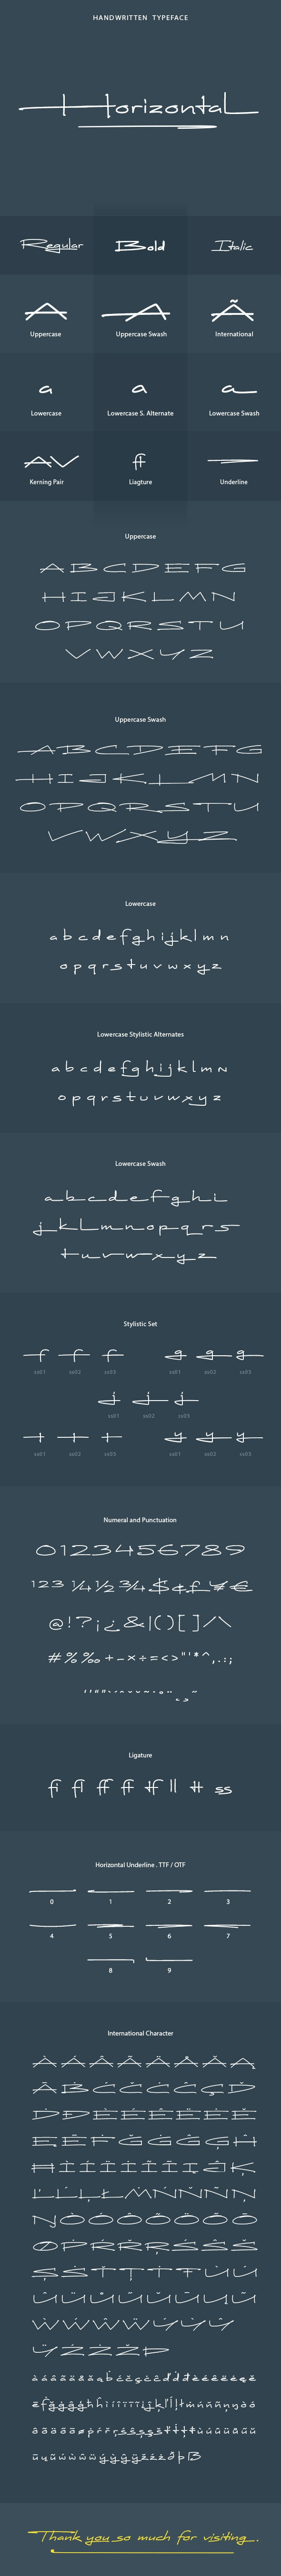 Horizontal Font - Hand-writing Script